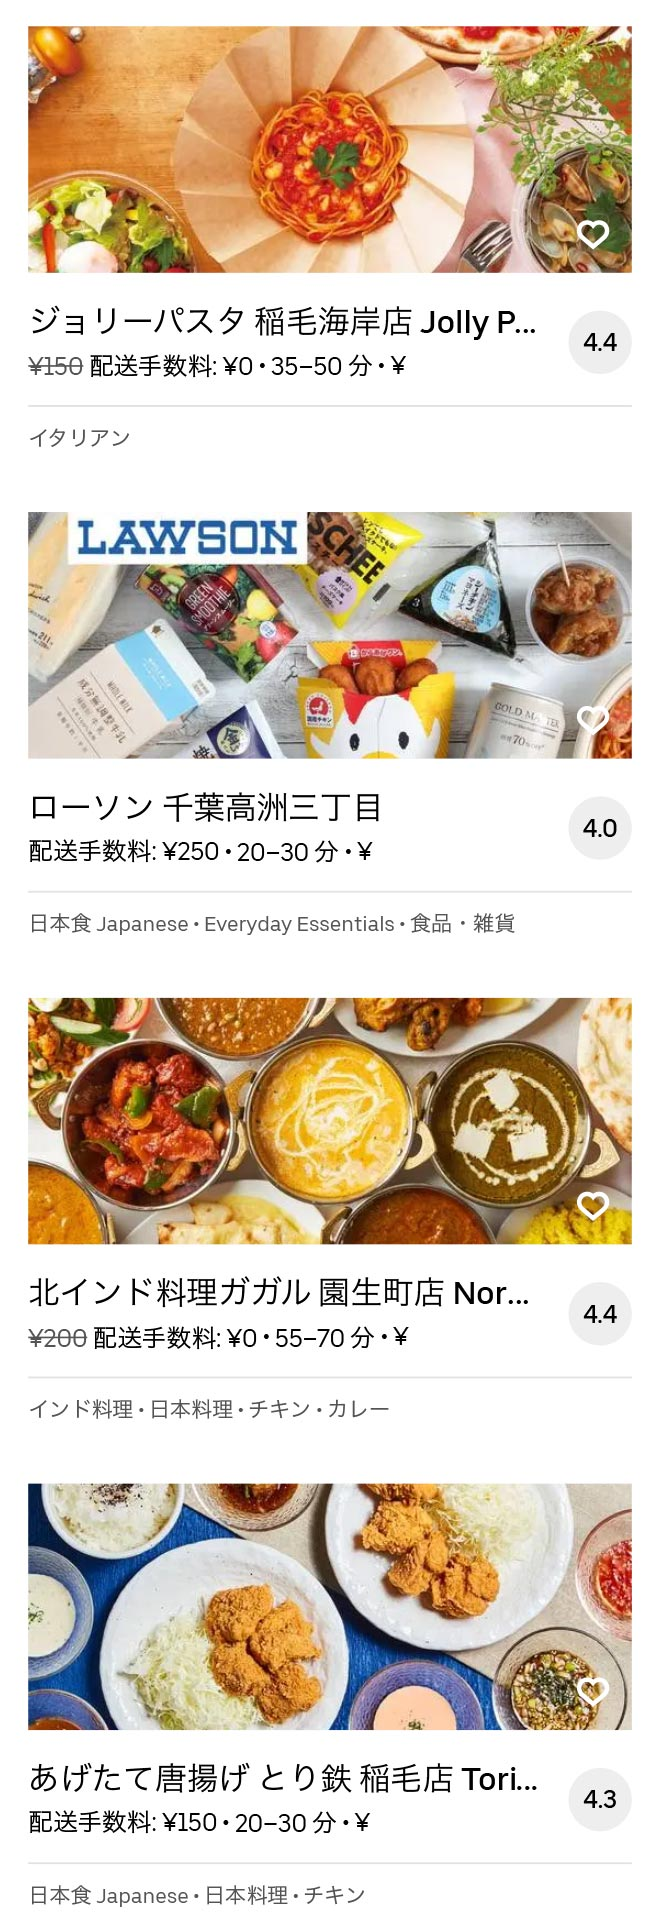 Inage menu 2010 05